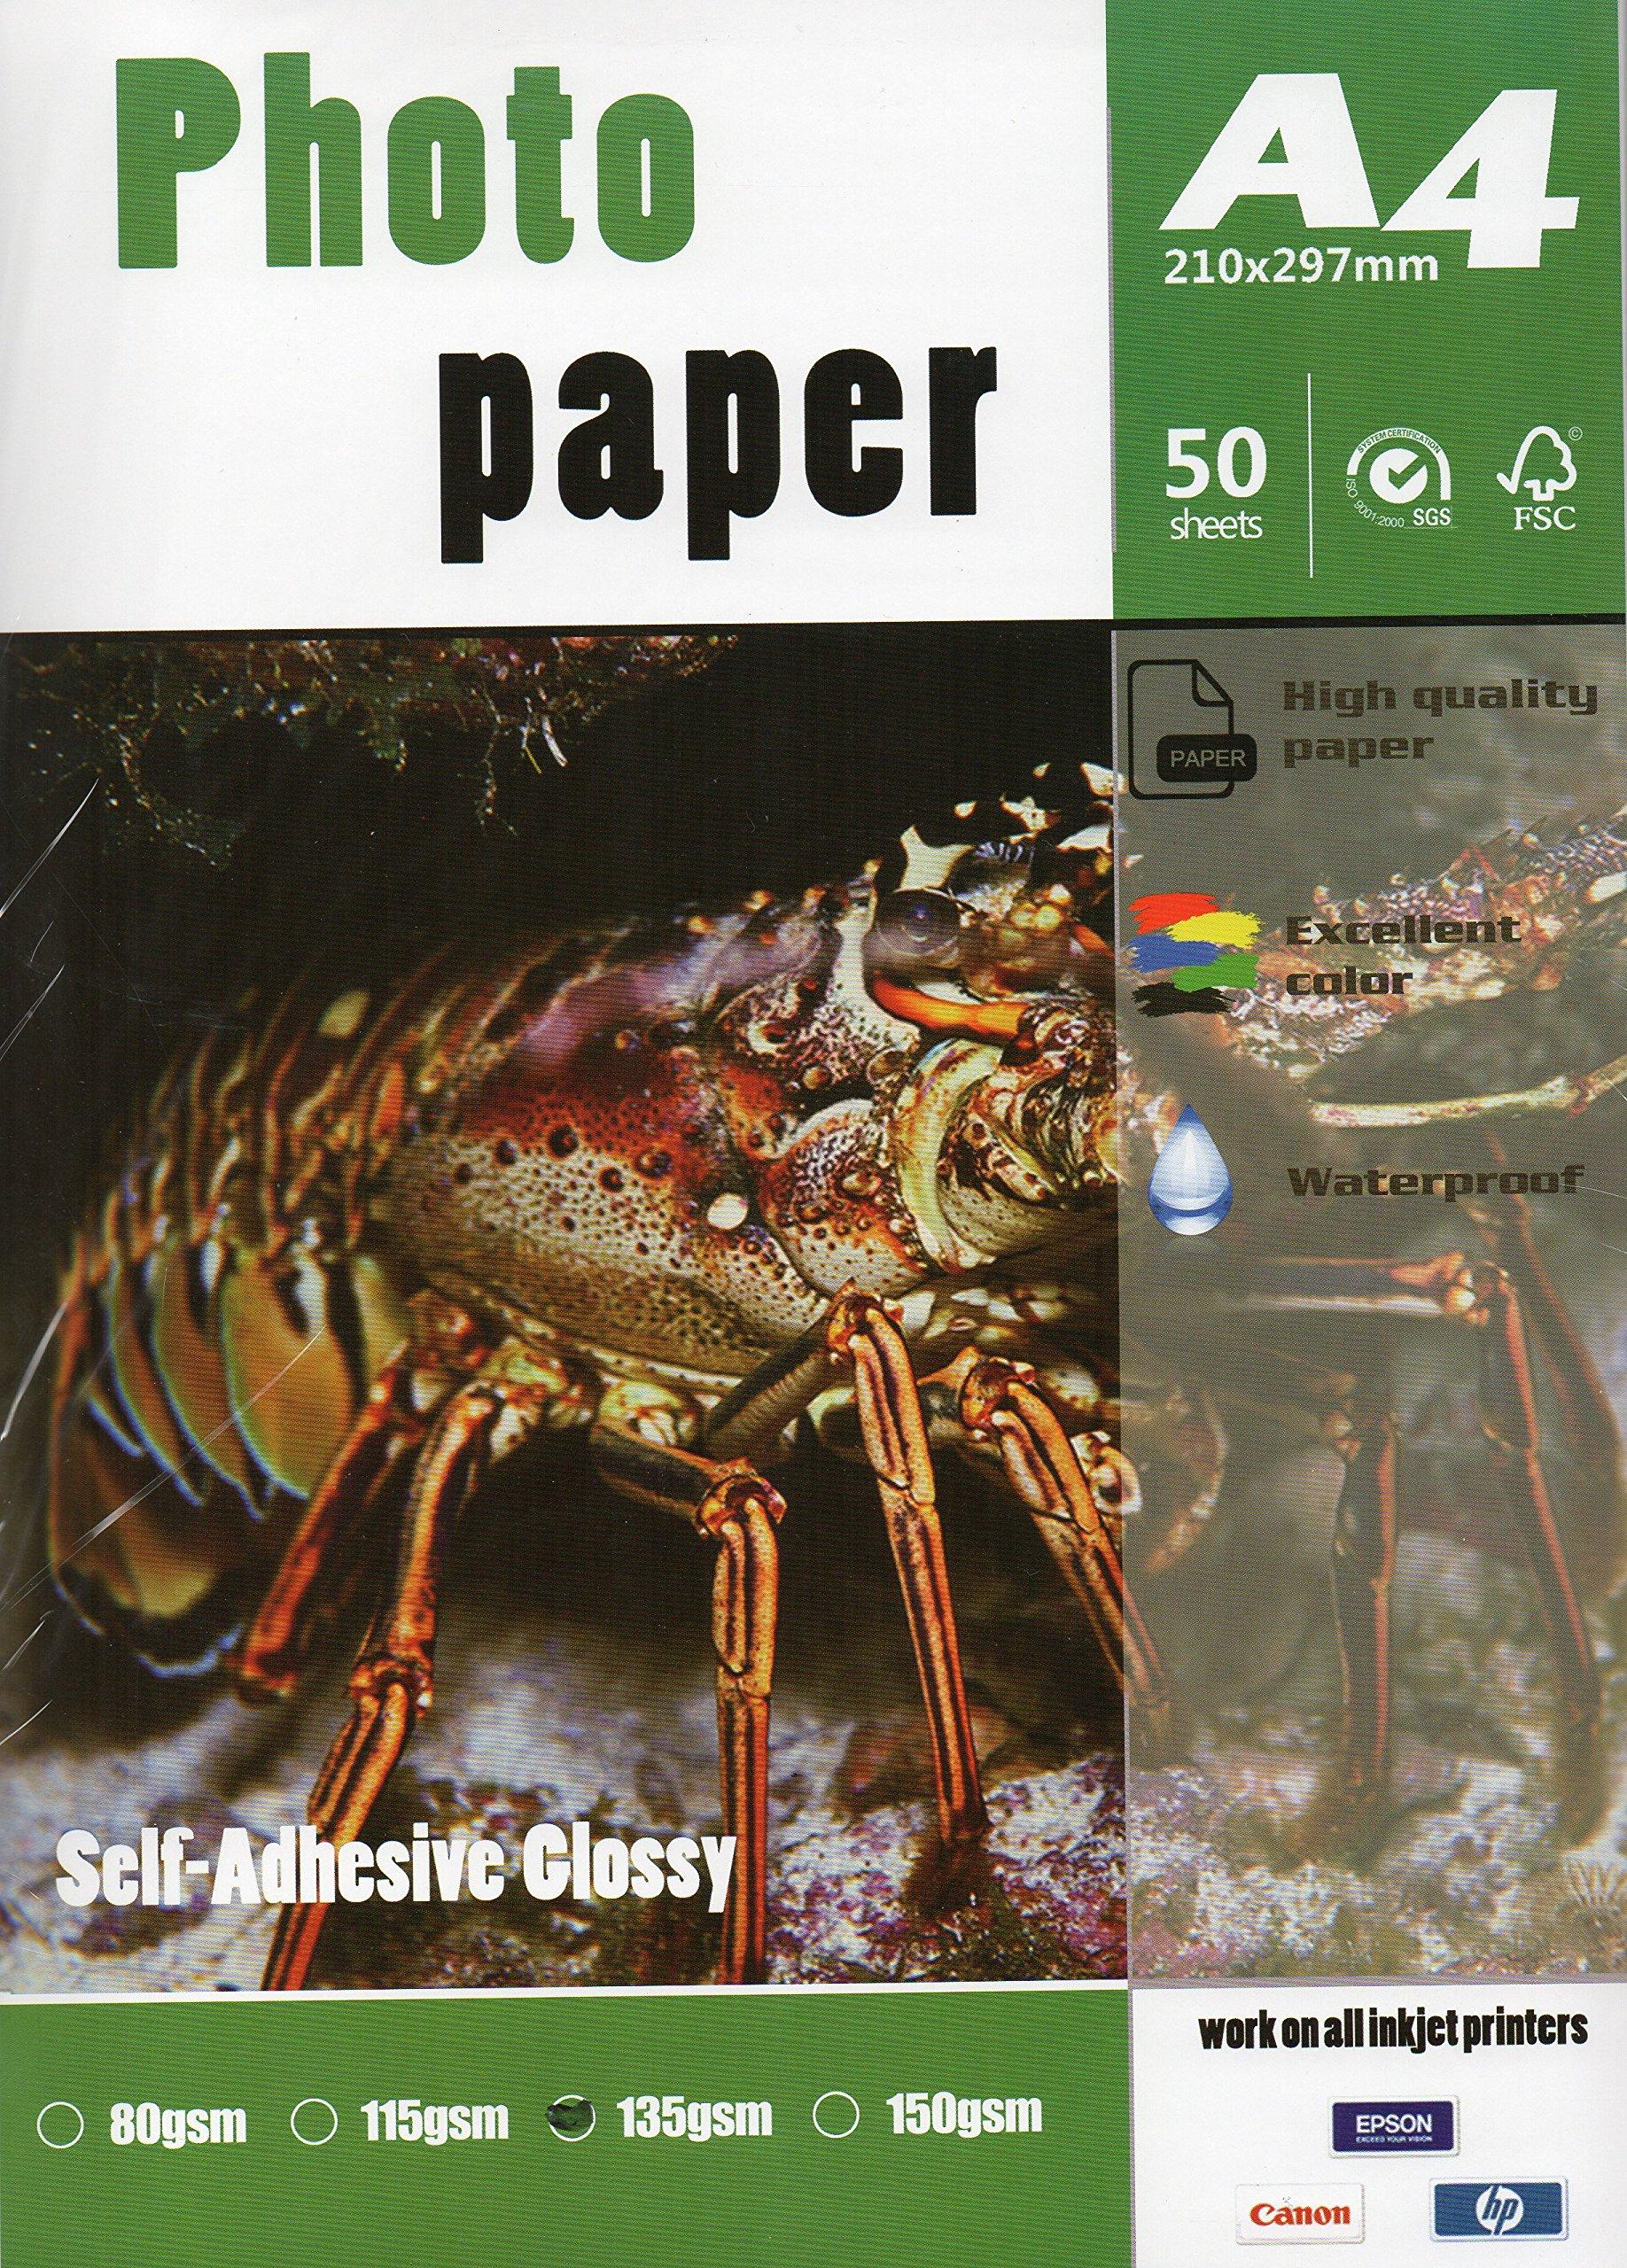 Self Adhesive Sticker Inkjet Photo Paper 8.3''x11.6'' A4 Size 50 Sheets 135gsm